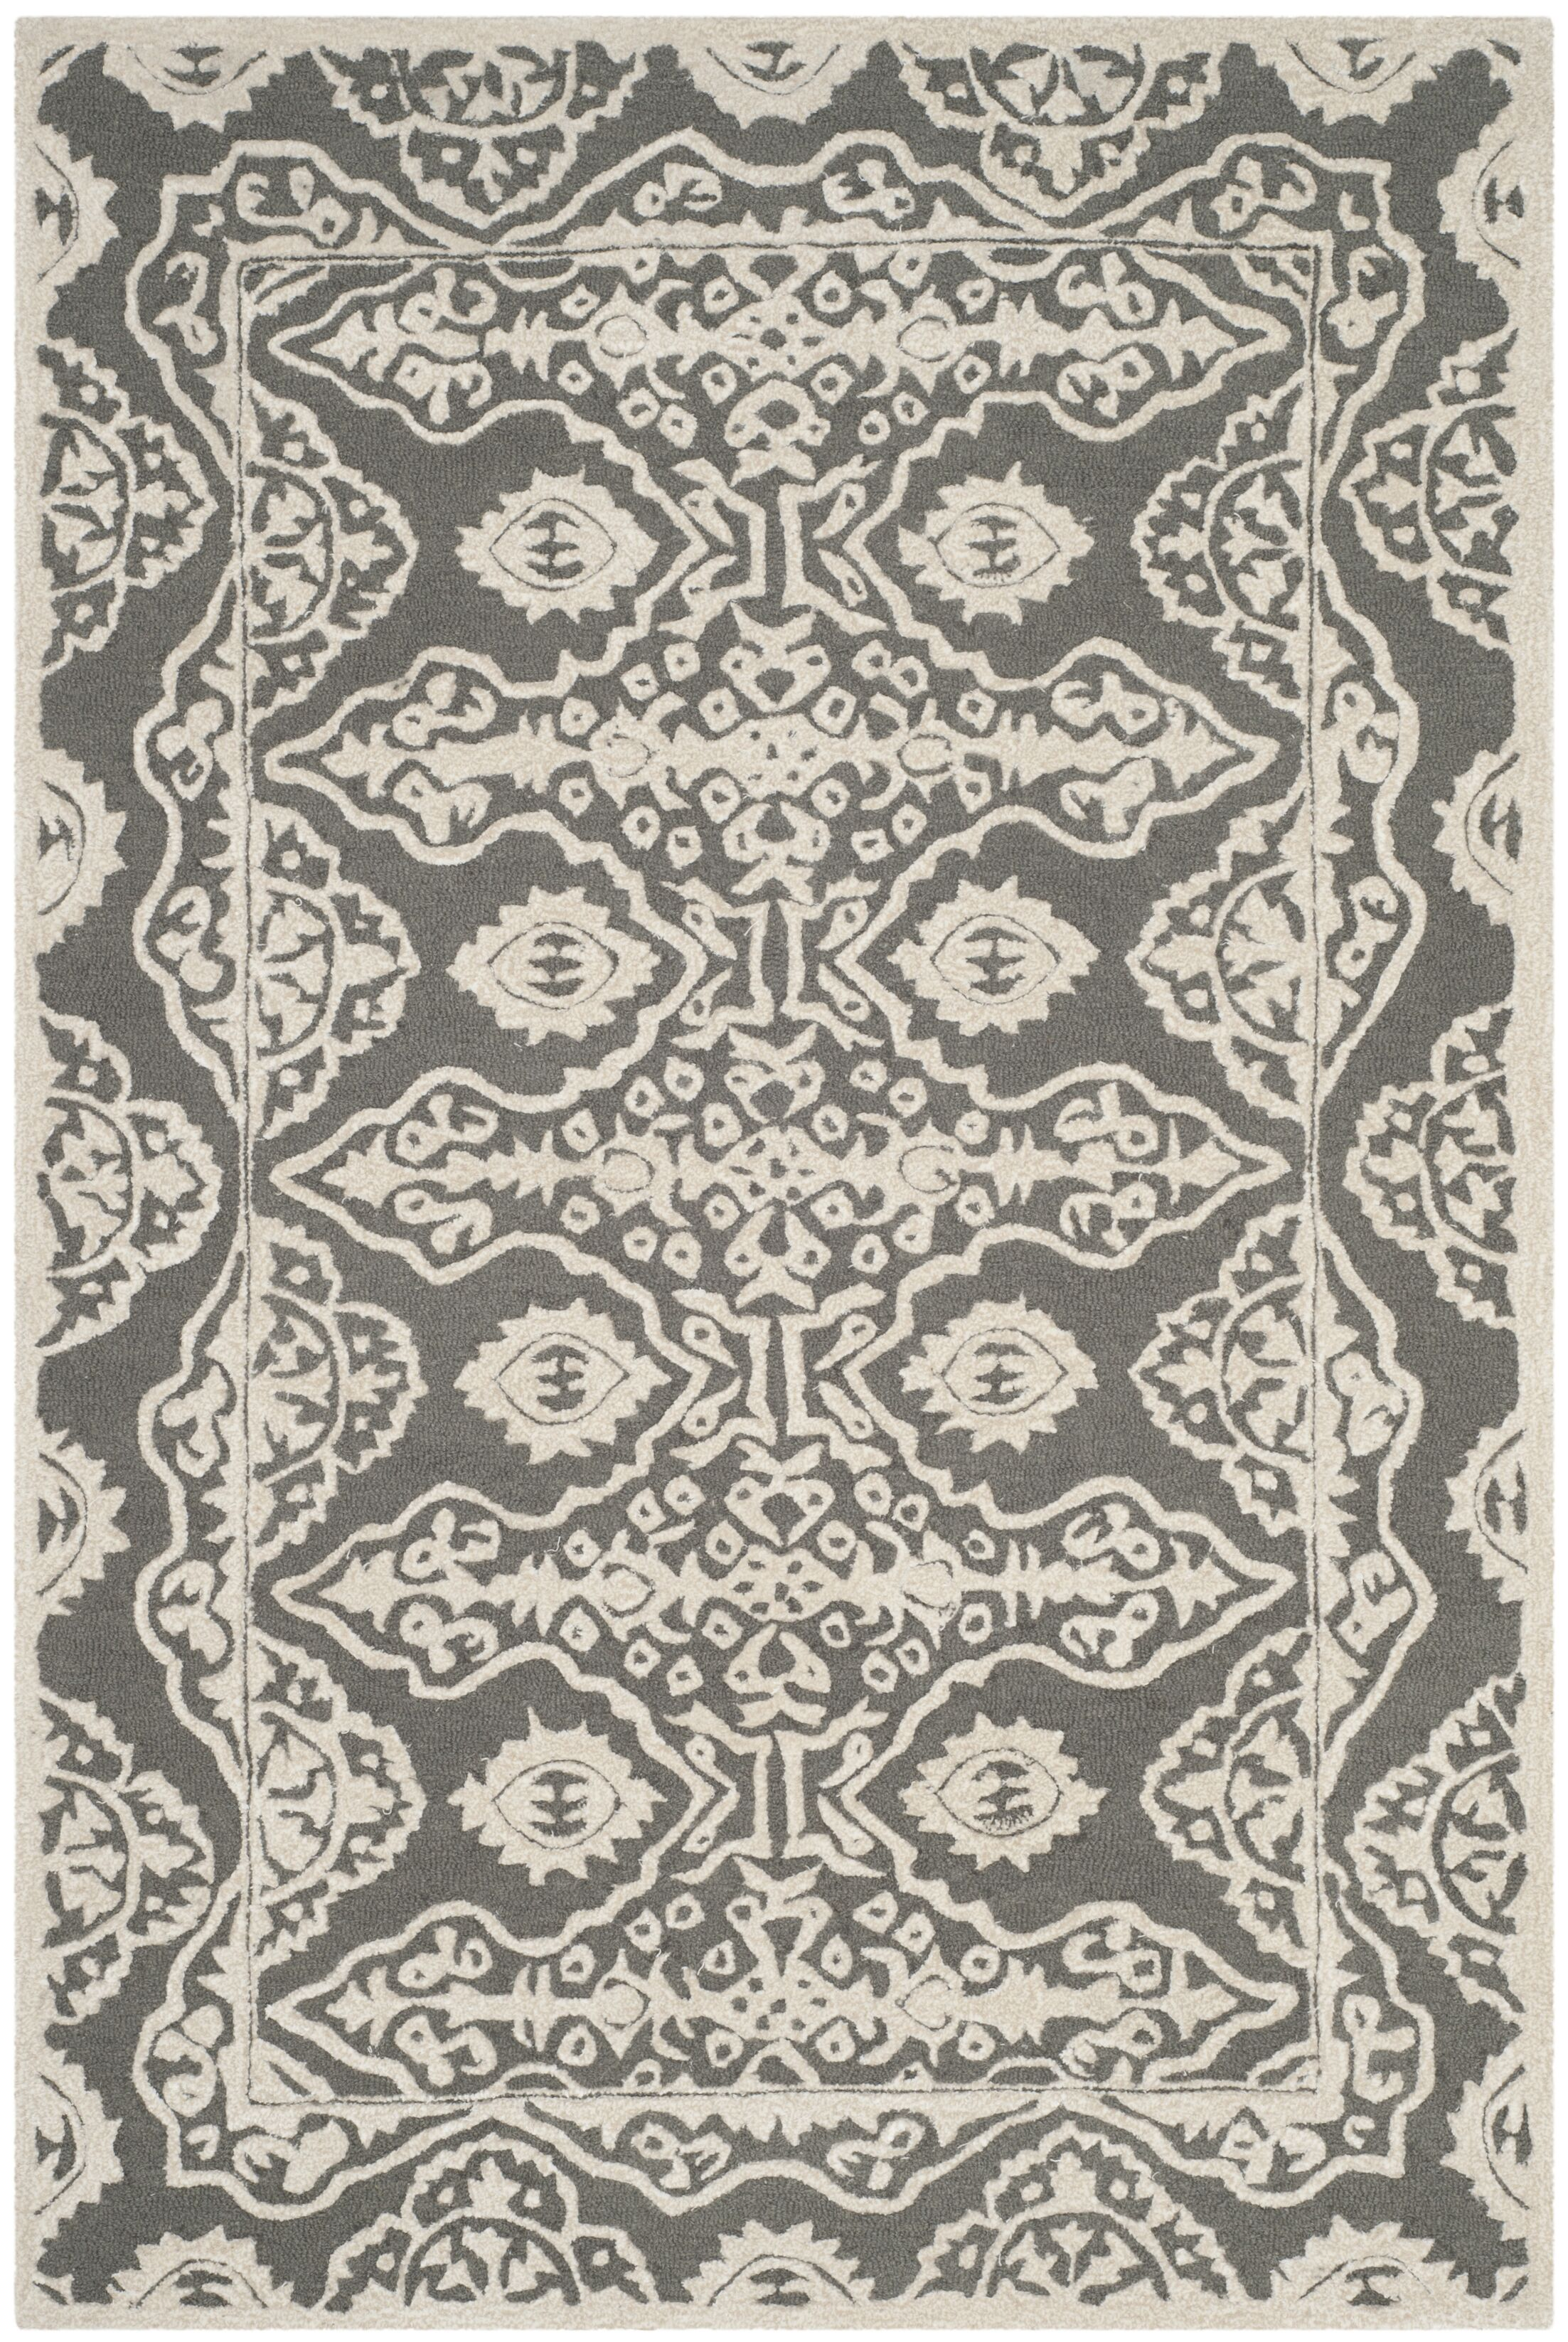 Amundson Hand-Tufted Gray/Ivory Area Rug Rug Size: Rectangle 4' x 6'